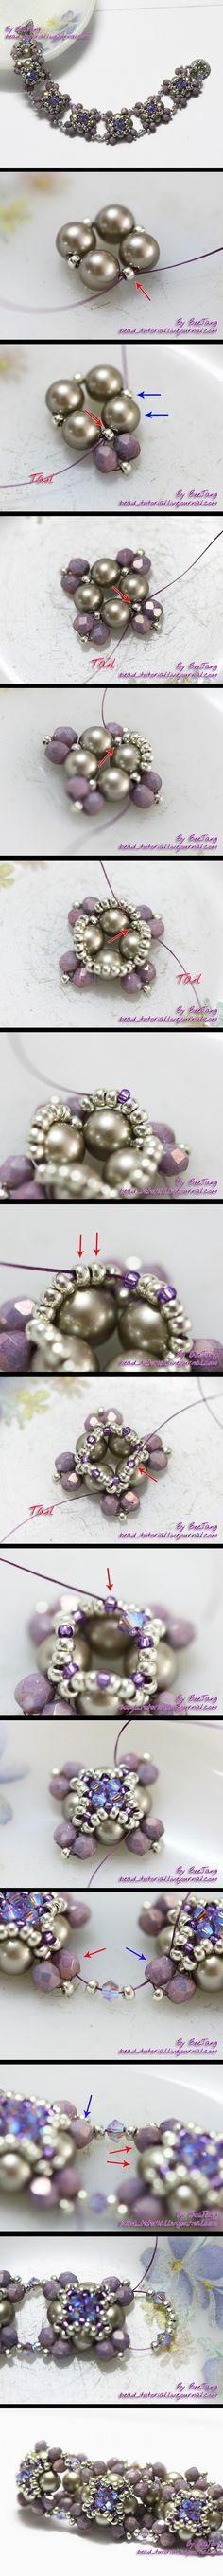 PAP de bracelete